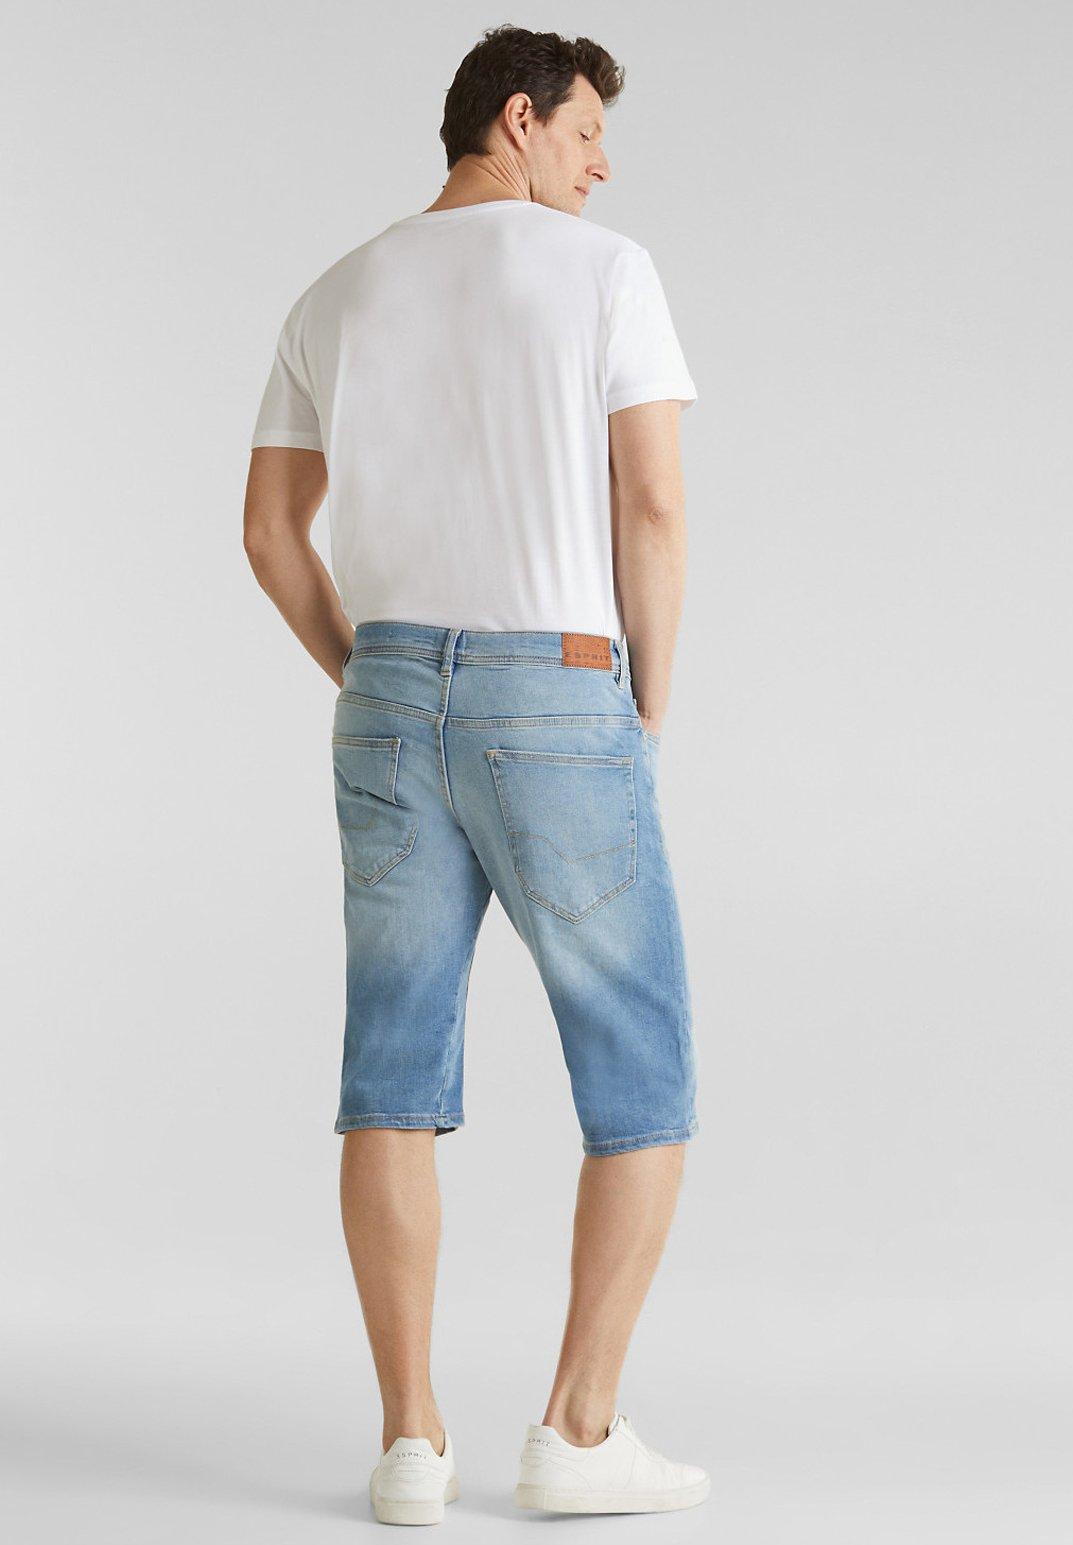 Esprit Bermuda-jeans Mit Washed Out-effekt - Jeansshorts Blue Light